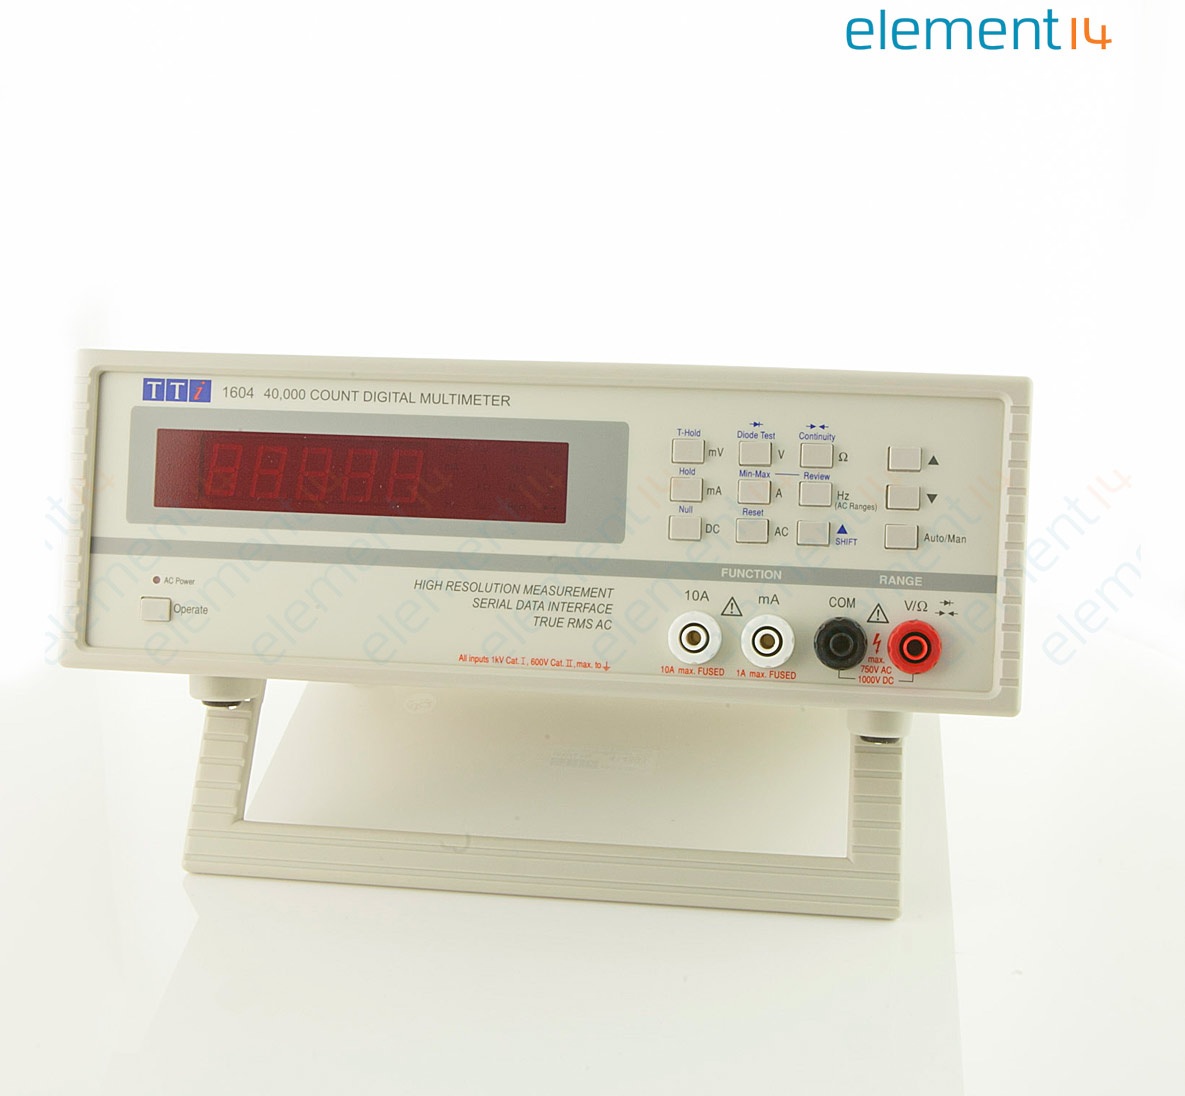 Dmm1604 Aim Tti Instruments Bench Digital Multimeter 1604 Series 40000 Count True Rms Auto